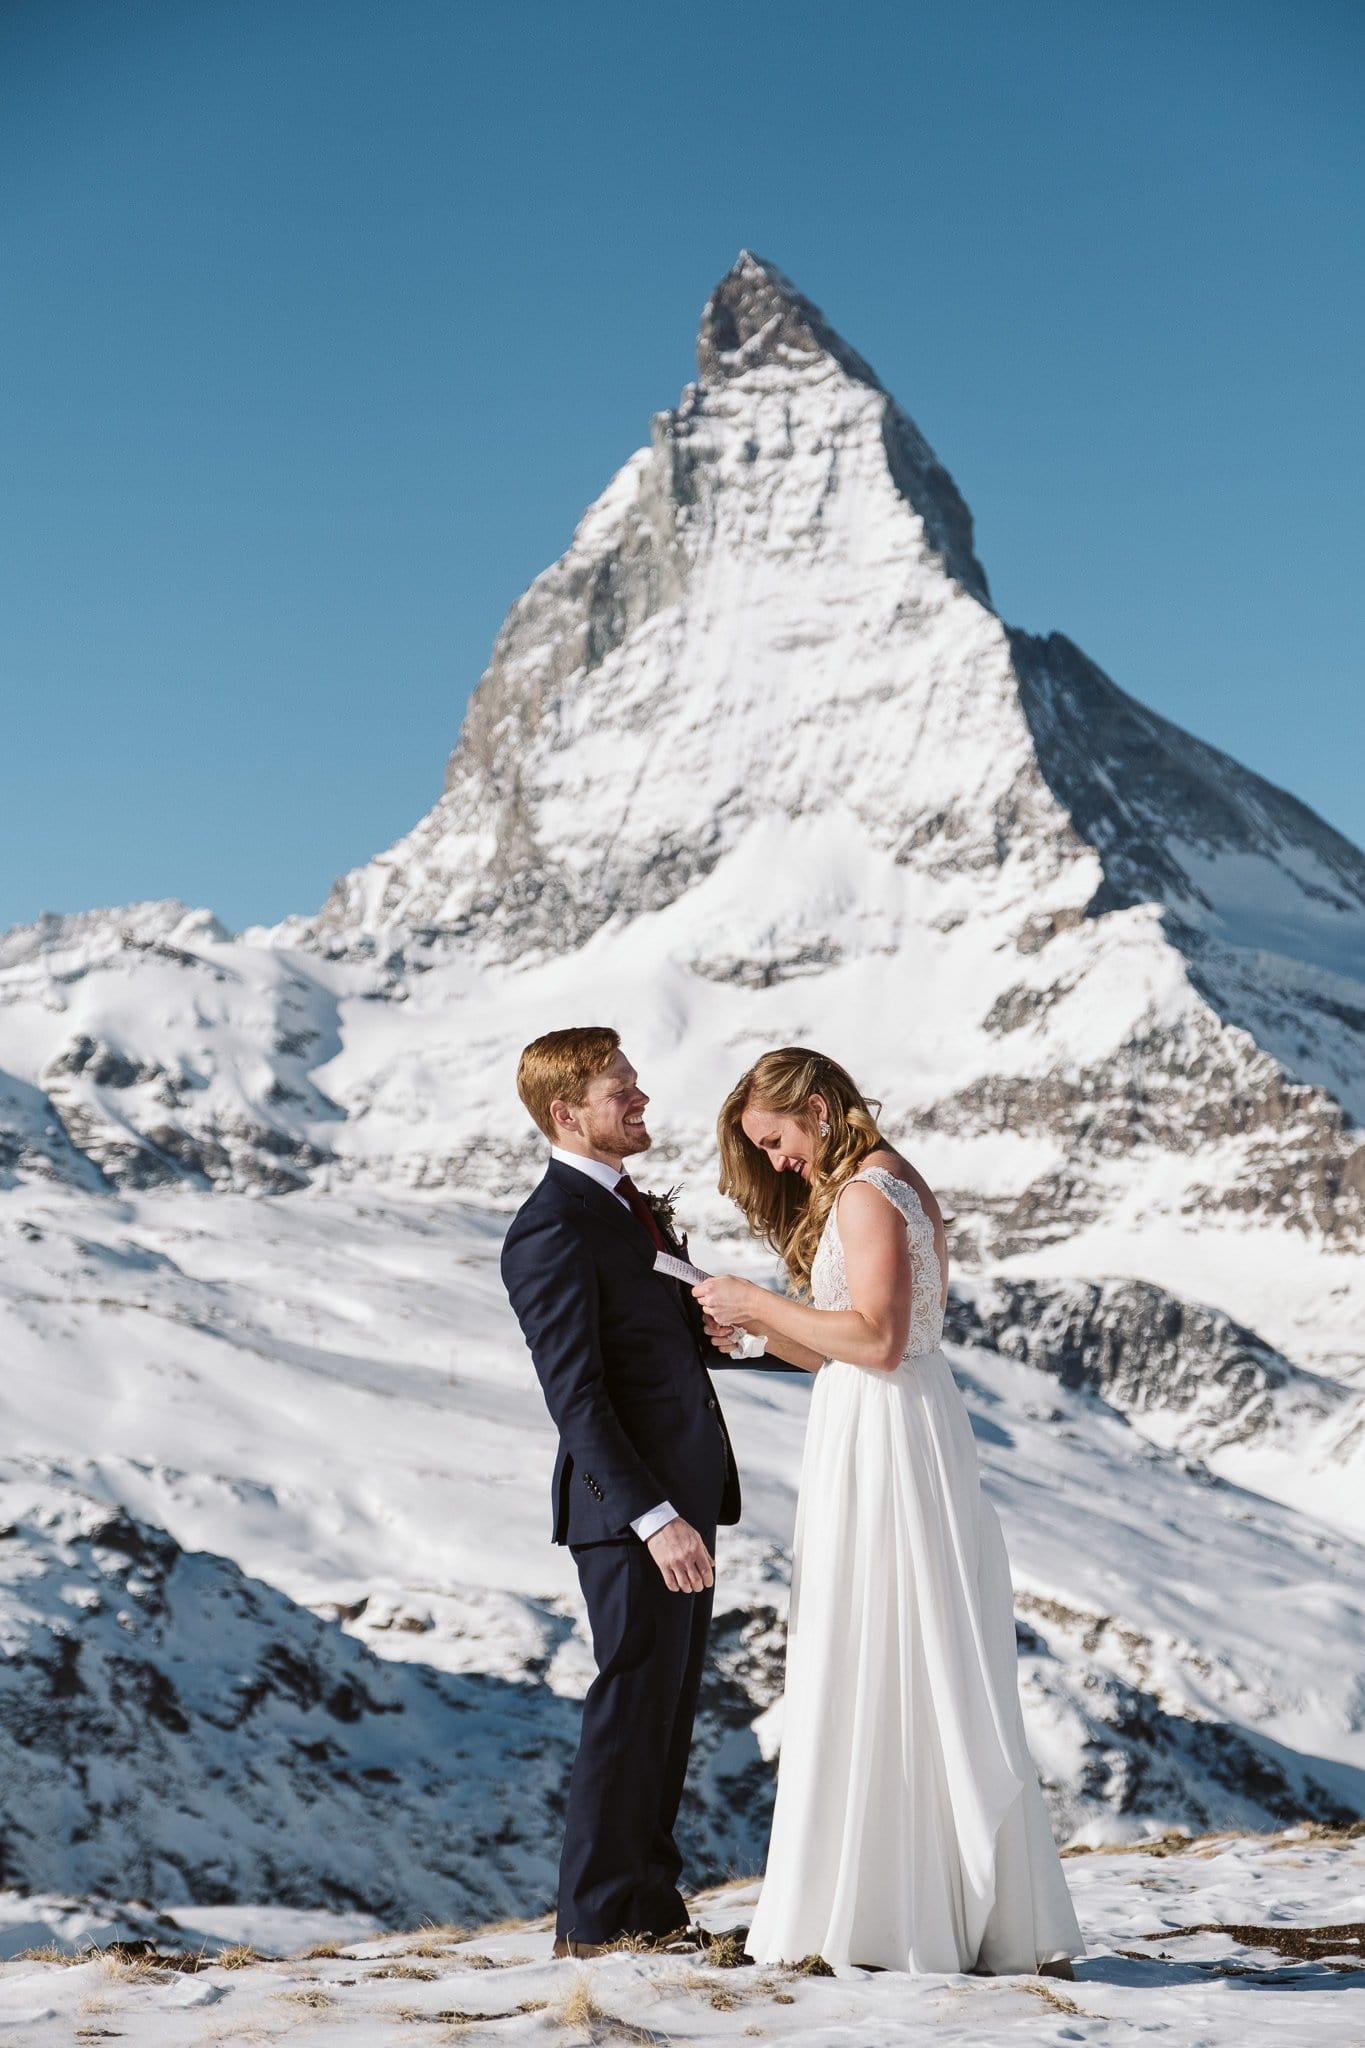 Hiking elopement at Matterhorn in Zermatt, Switzerland